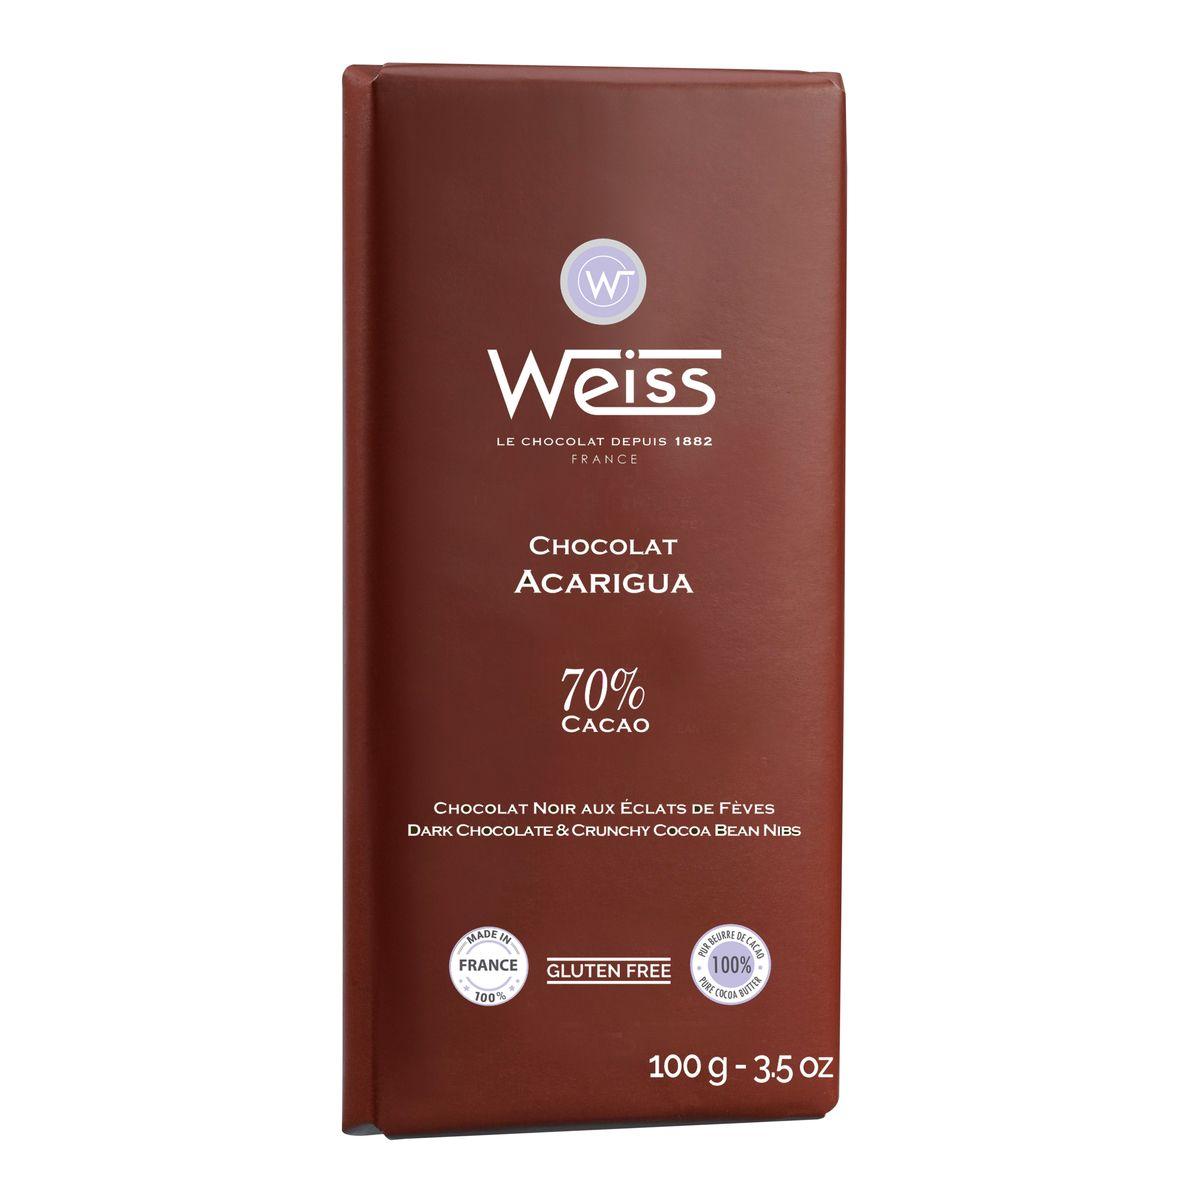 Tablette acarigua éclat feve 100gr - Weiss